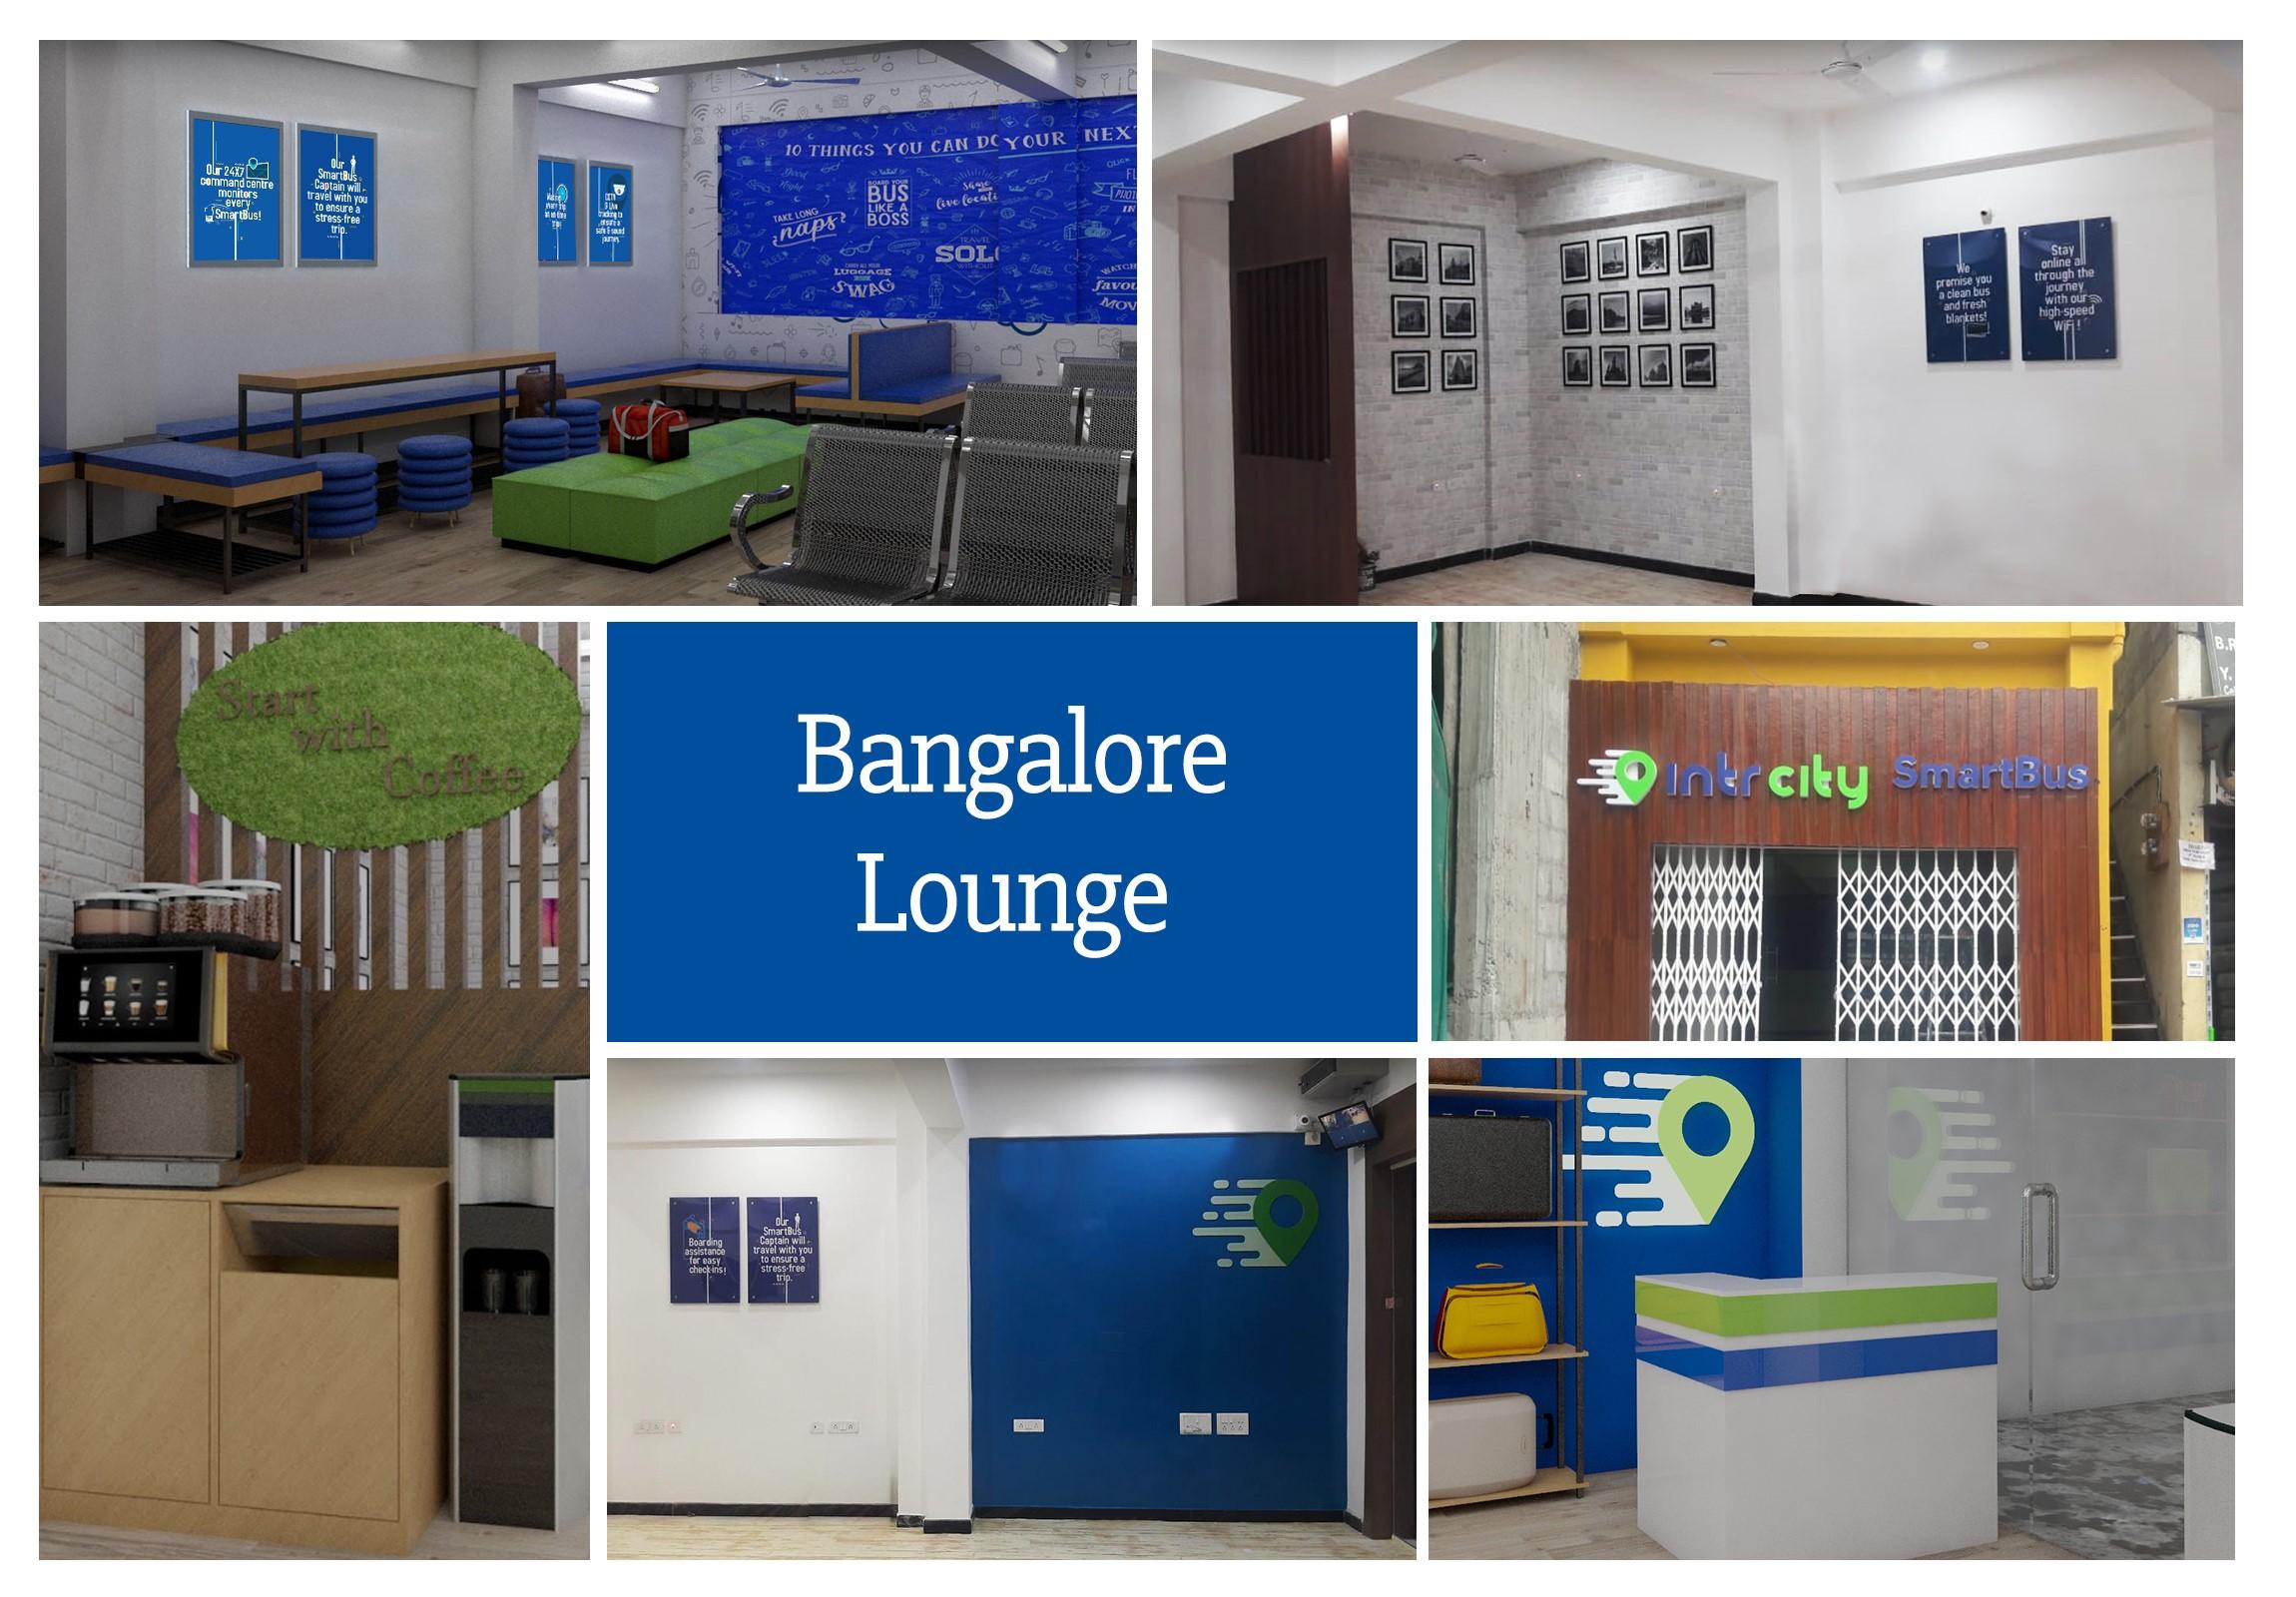 Intrcity by railyatri  smartbus lounge  bangalore pics  1572865792